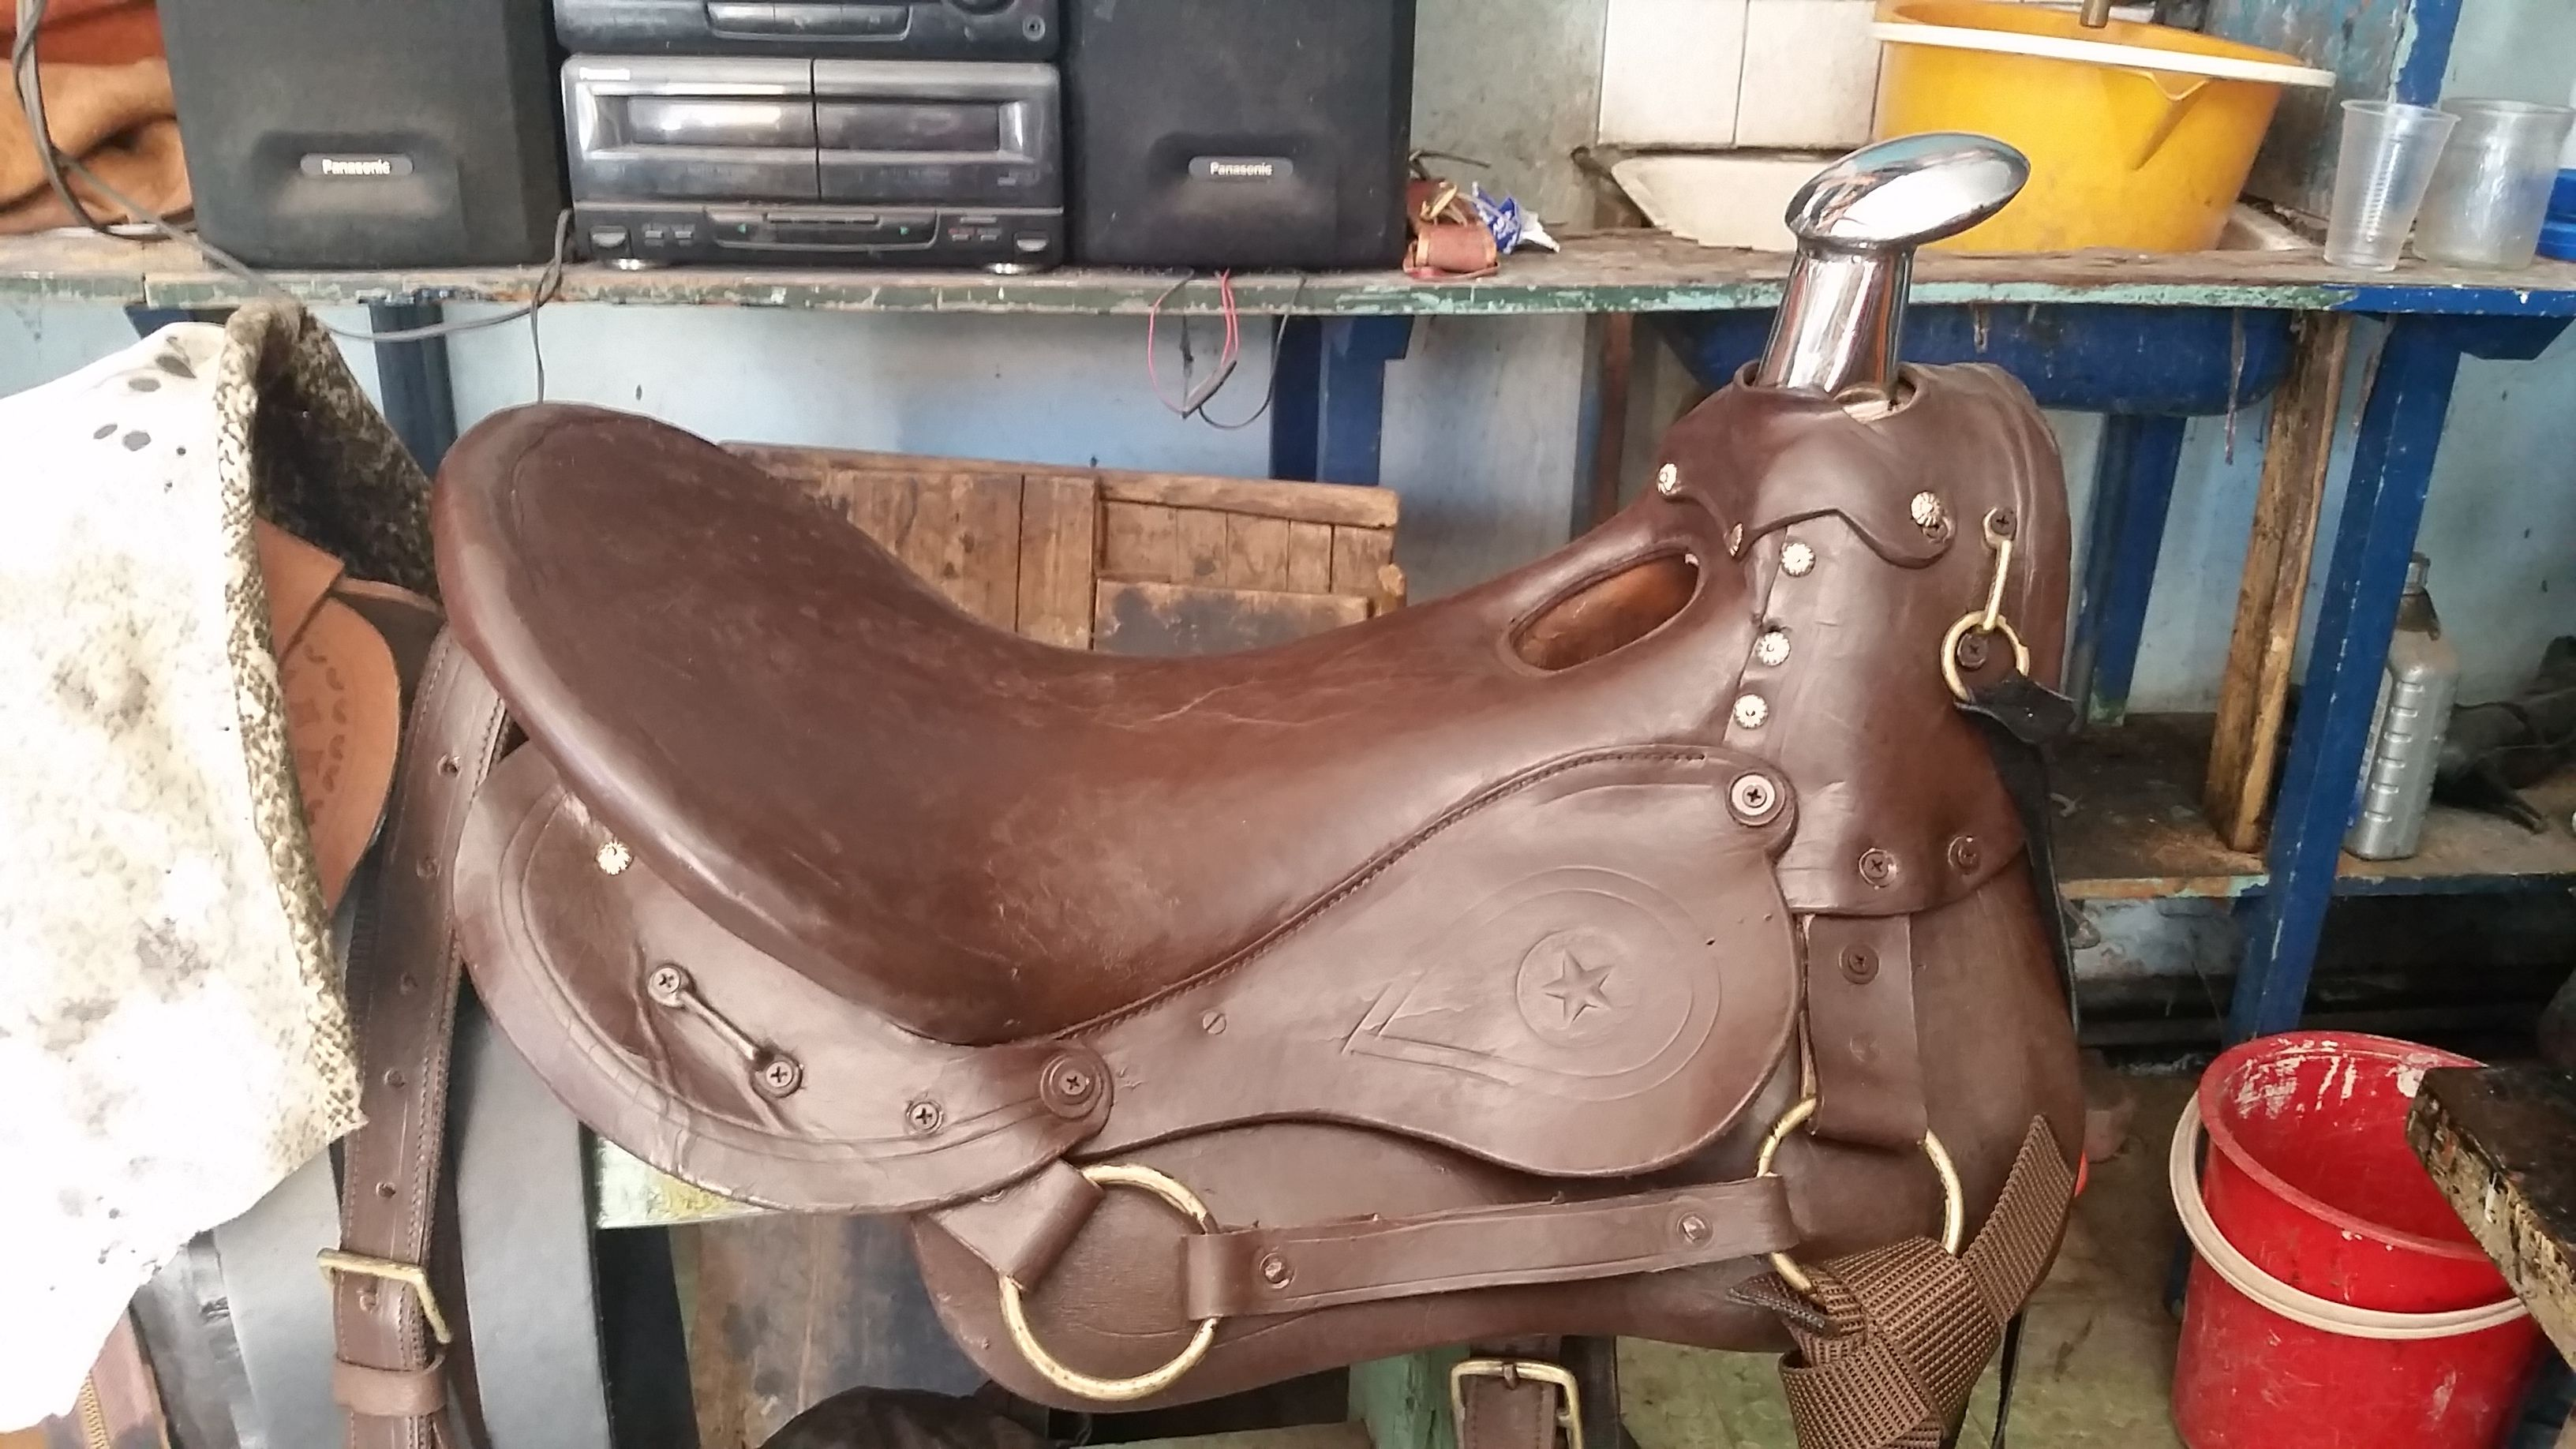 12f437d4477 Te ofrecemos #sillas para montar a caballo de segunda pero de una excelente  calidad para